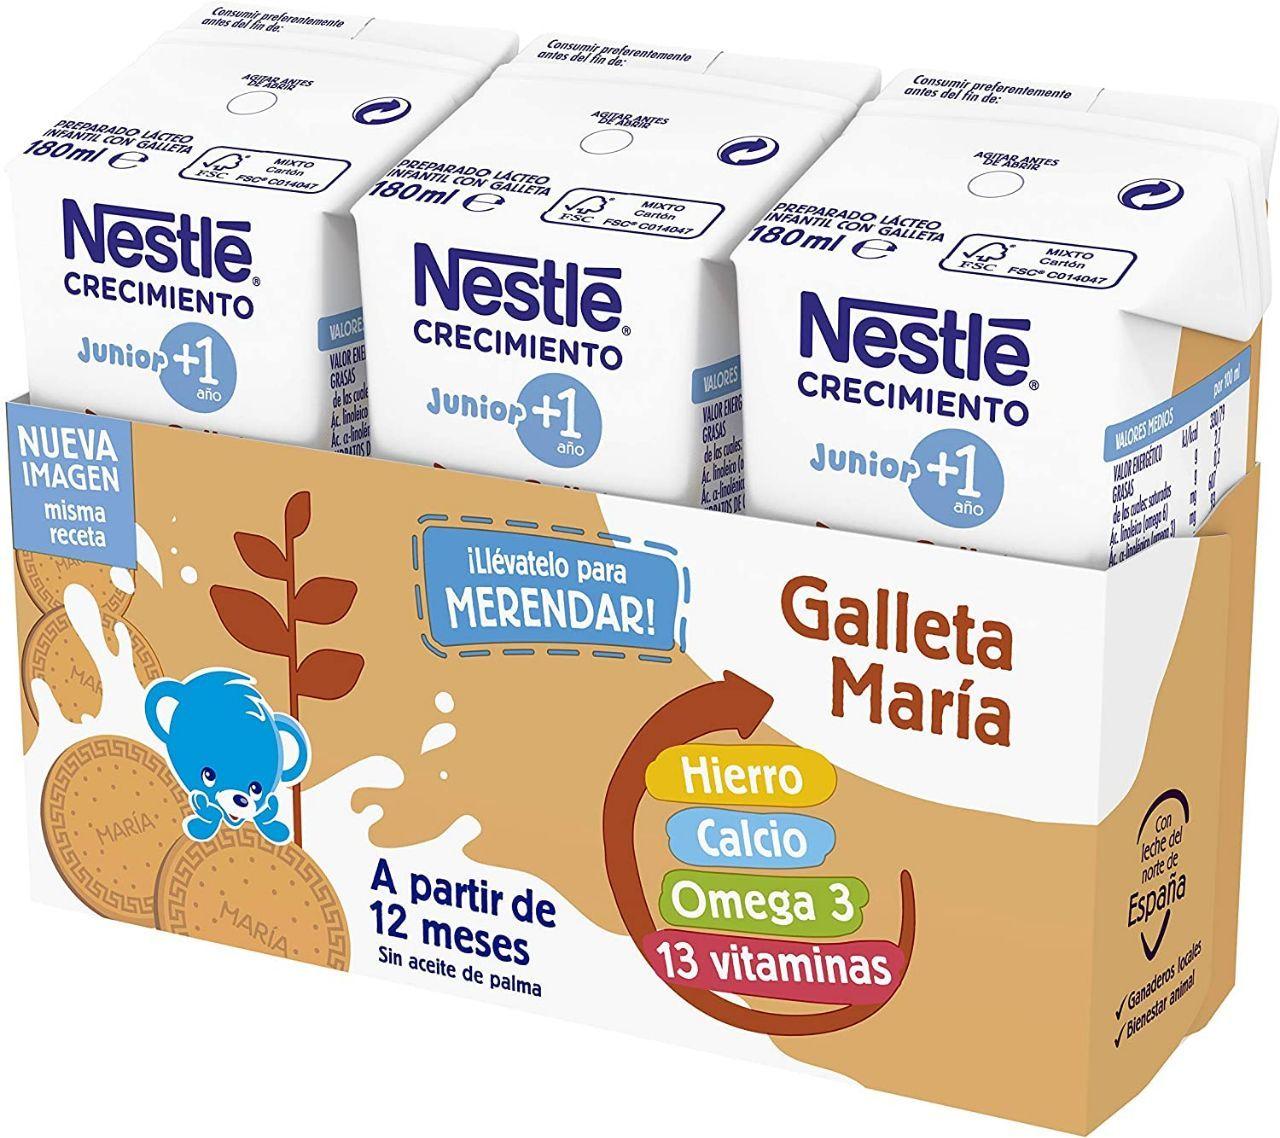 Pack de 24x180ml de leche de crecimiento por solo 4,45€